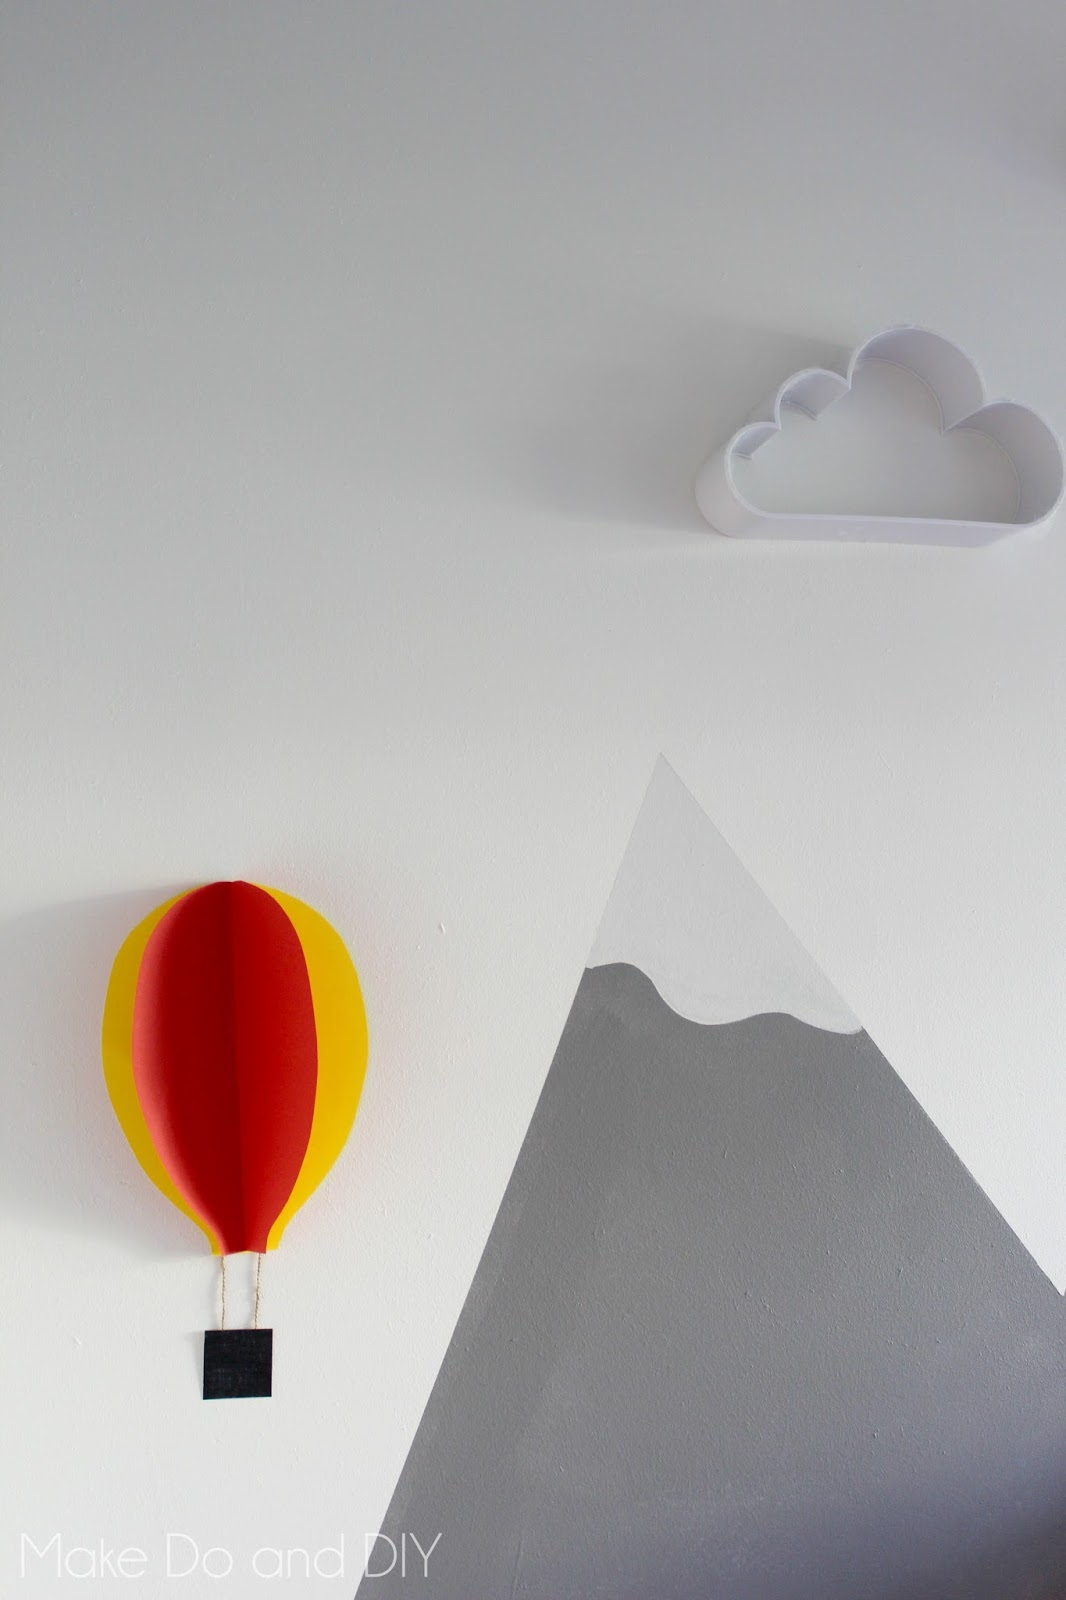 craft tutorial - 3D balloons ~ Make Do and DIY